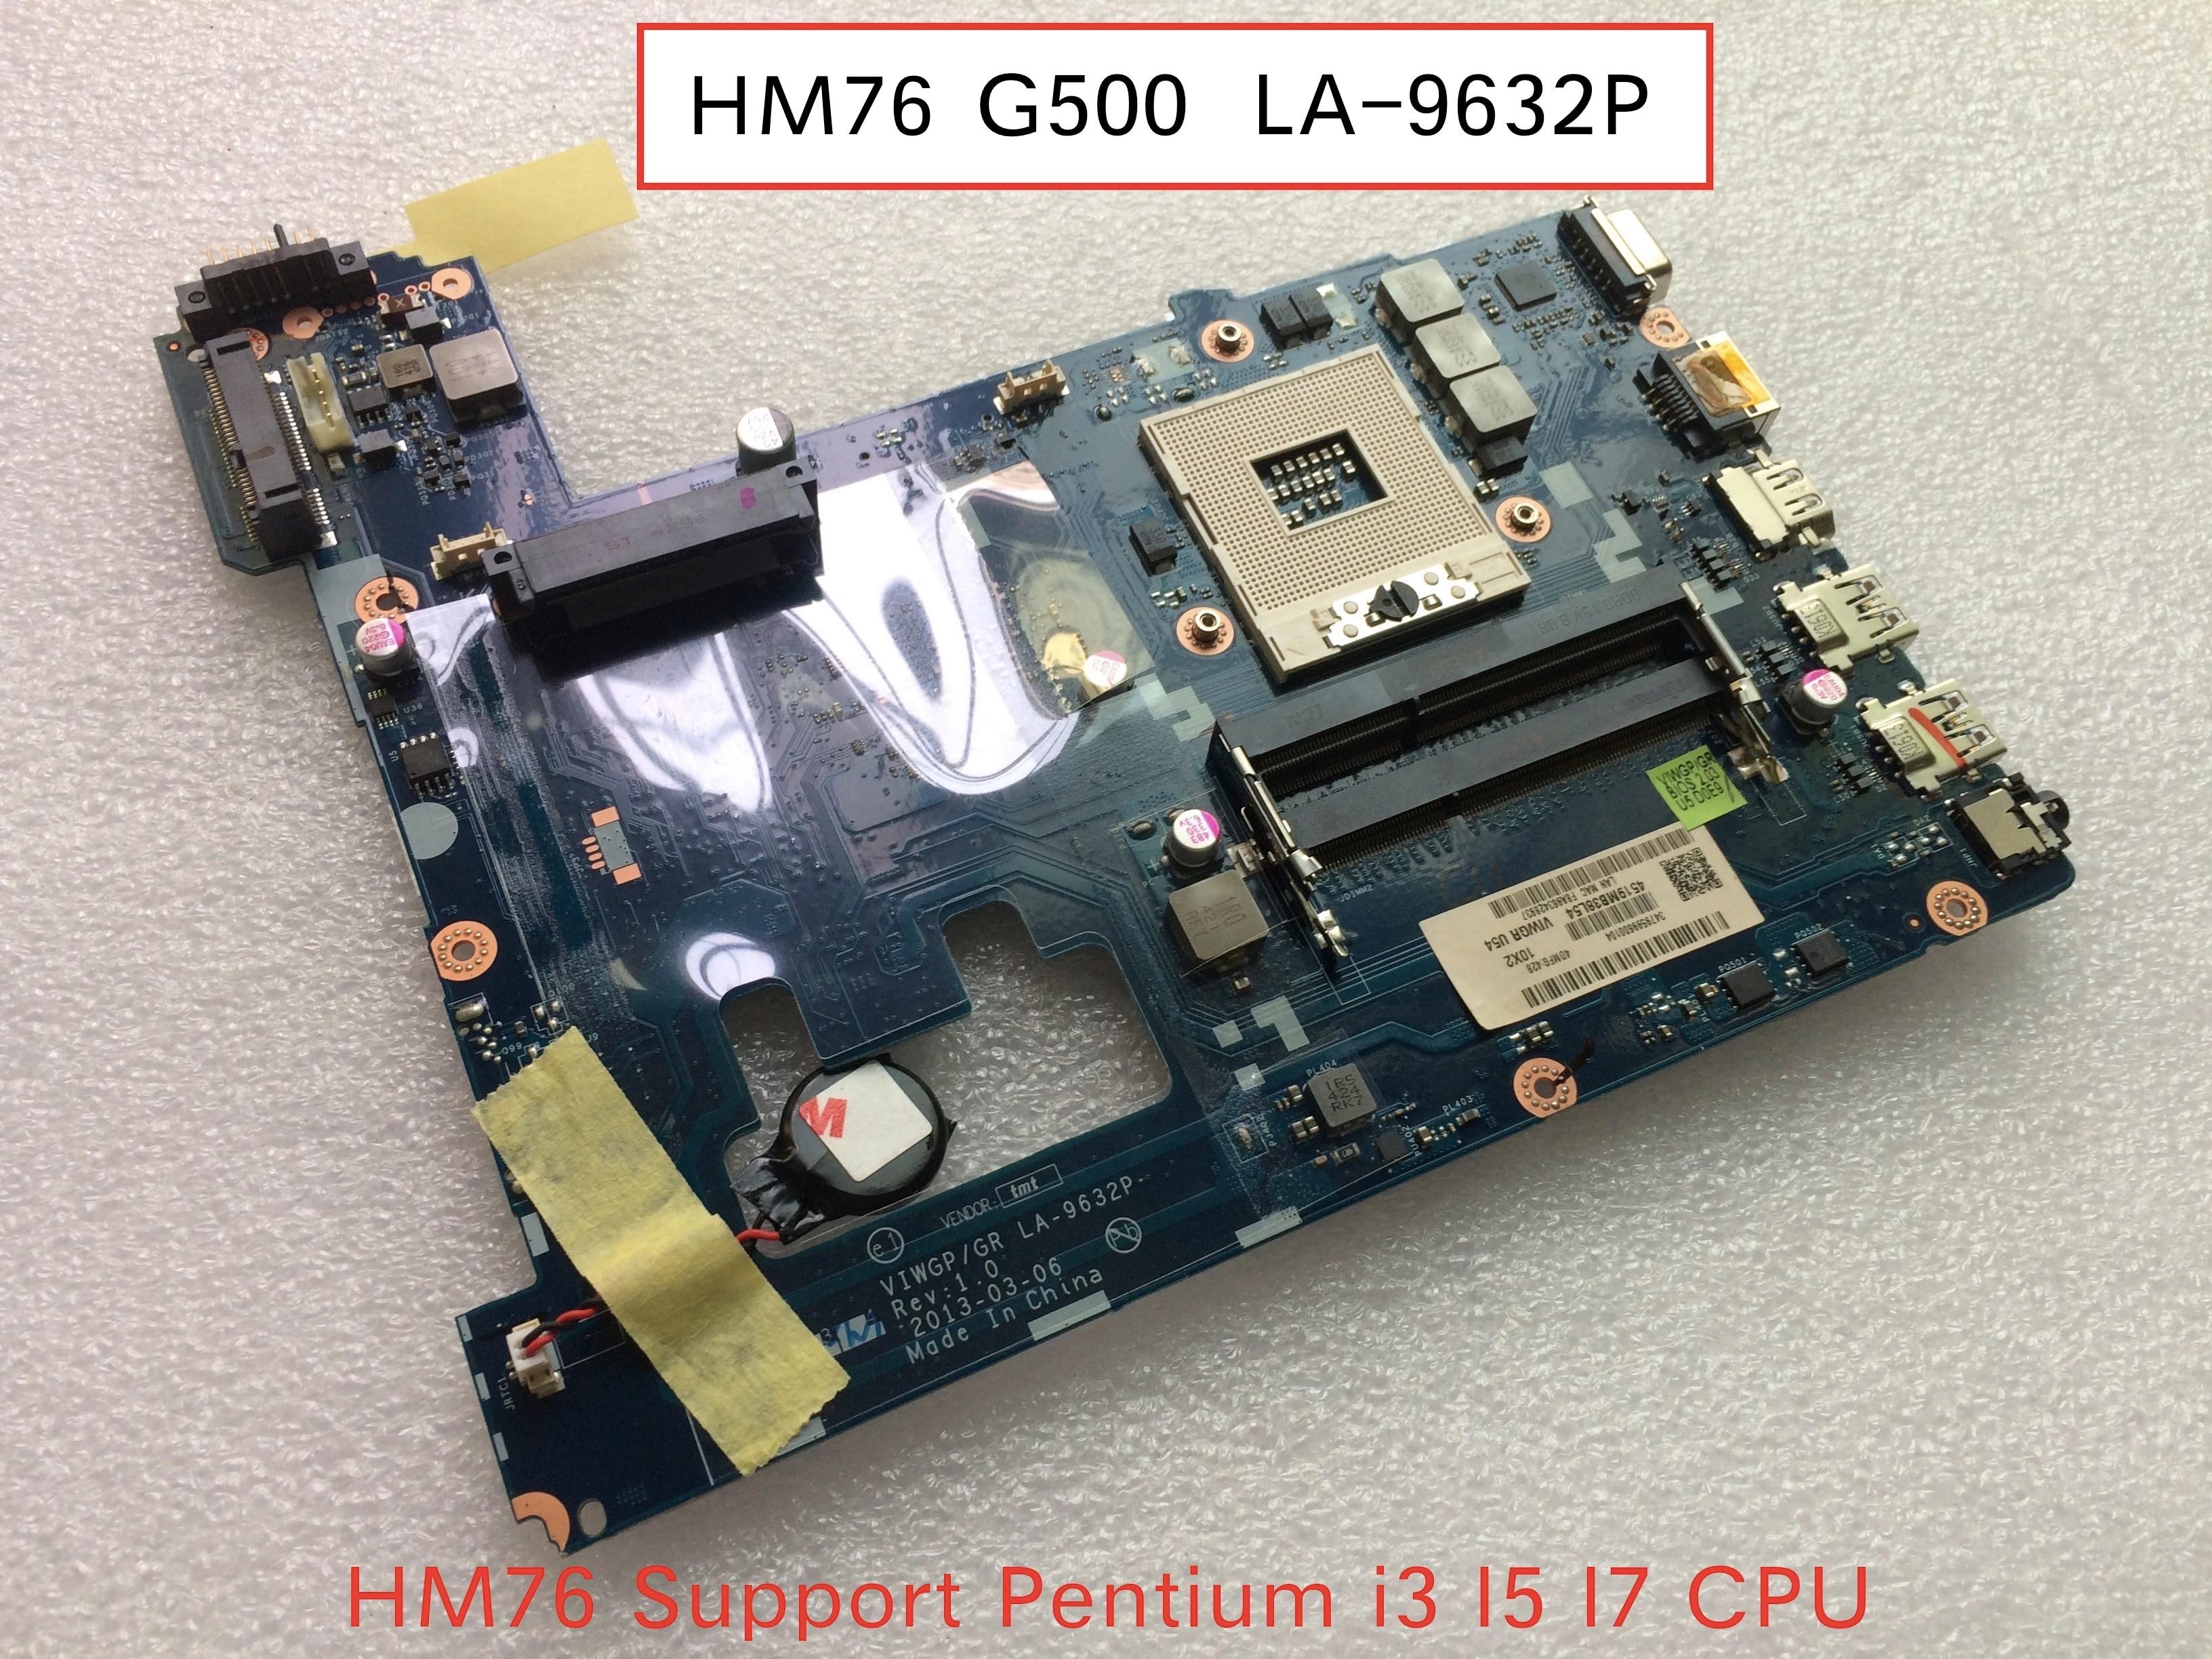 Original For Lenovo G500 VIWGP/GR LA-9632P Laptop PC Motherboard Mainboard